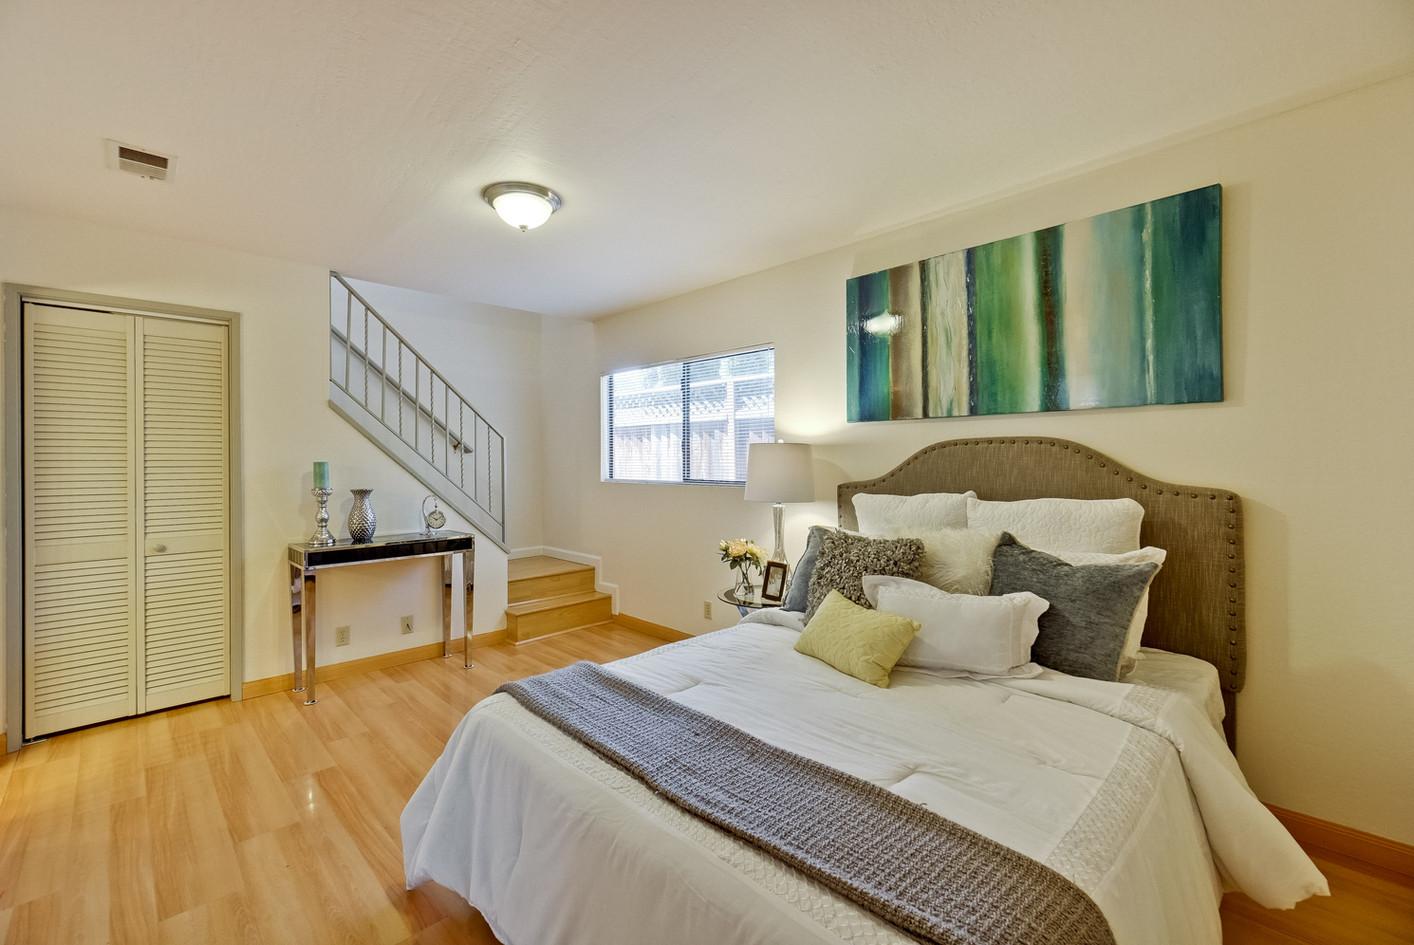 Master Bedroom with Loft